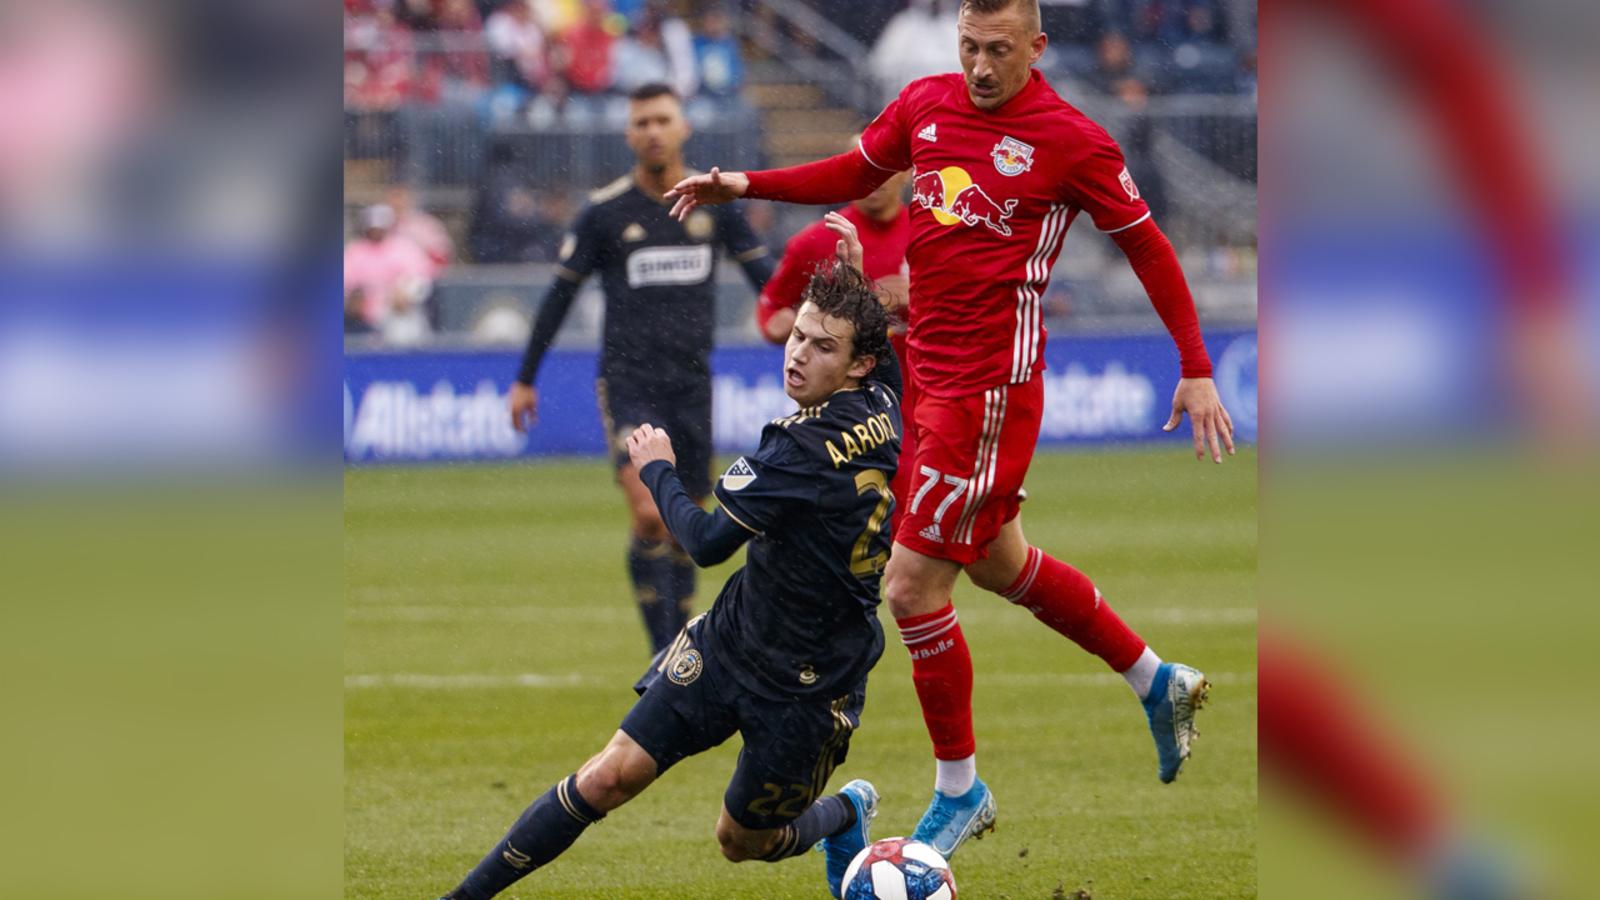 Philadelphia Union win first-ever MLS playoff game, will take on Atlanta United Thursday